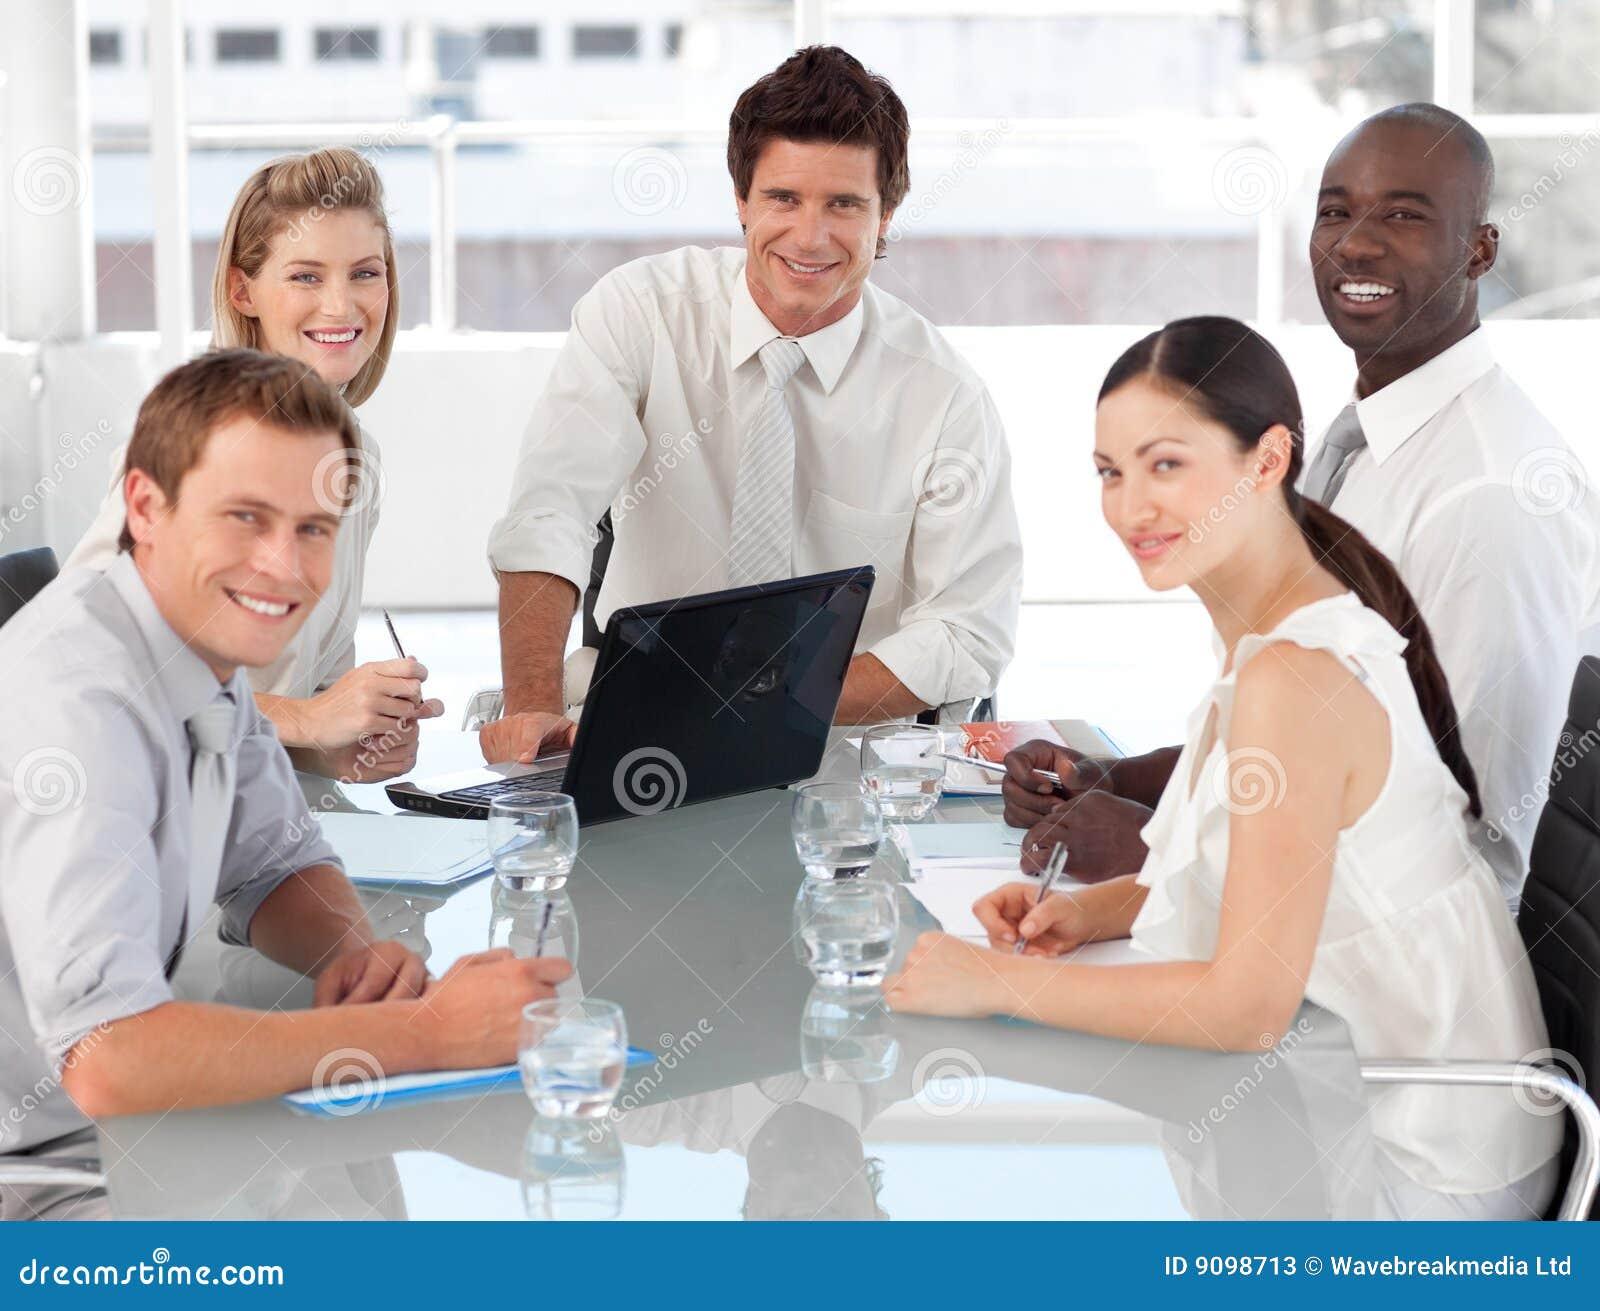 Junges multi kulturelles Geschäfts-Team bei der Arbeit